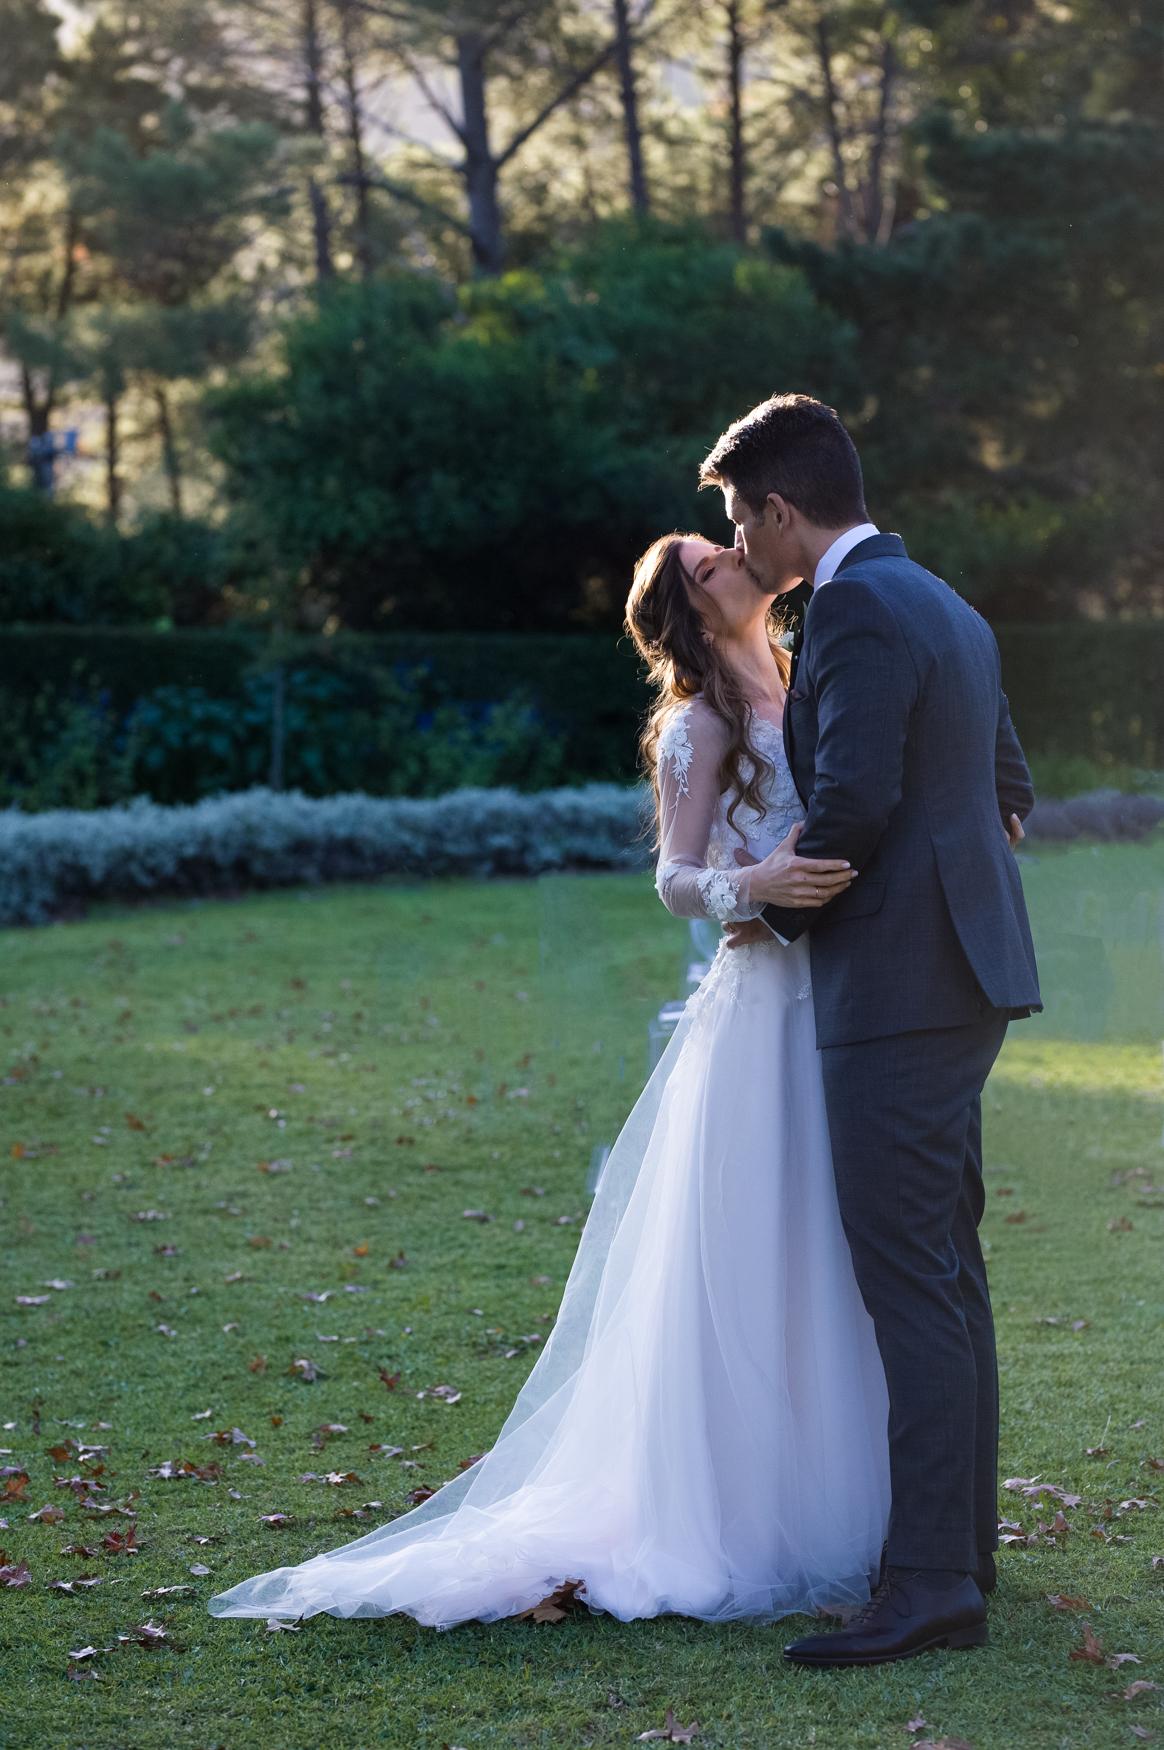 Leon_&_Martine's_Wedding_Photographs_17th_April_2019_@johnhenryweddingphoto_Low_Resolution_Web-376.JPG